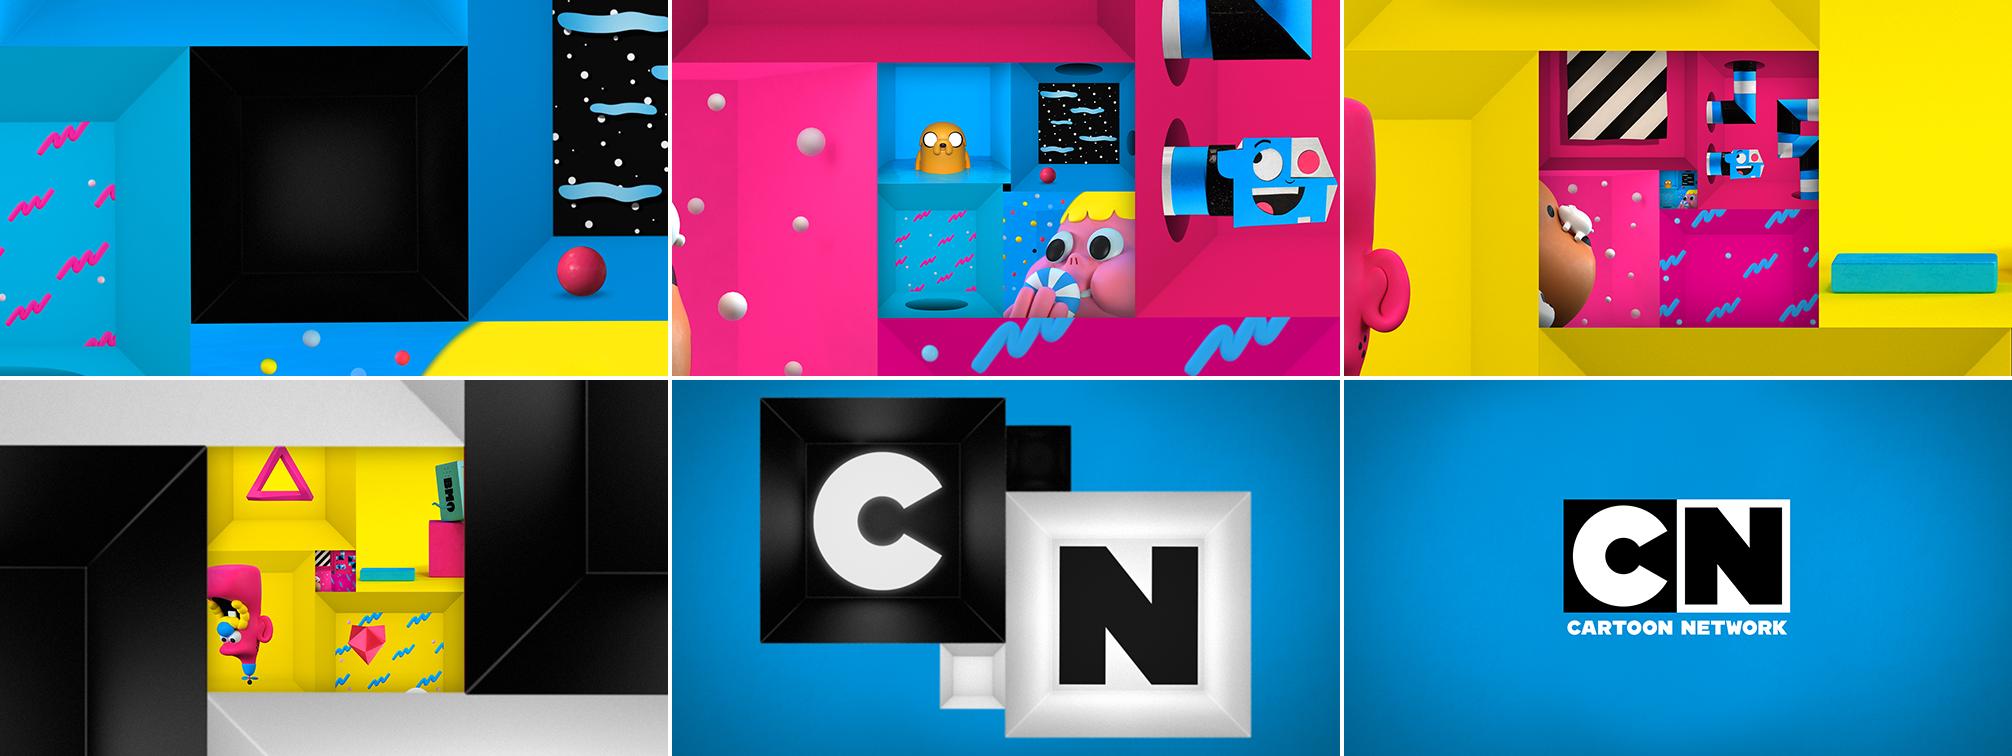 2Rooms_v07_collage.png